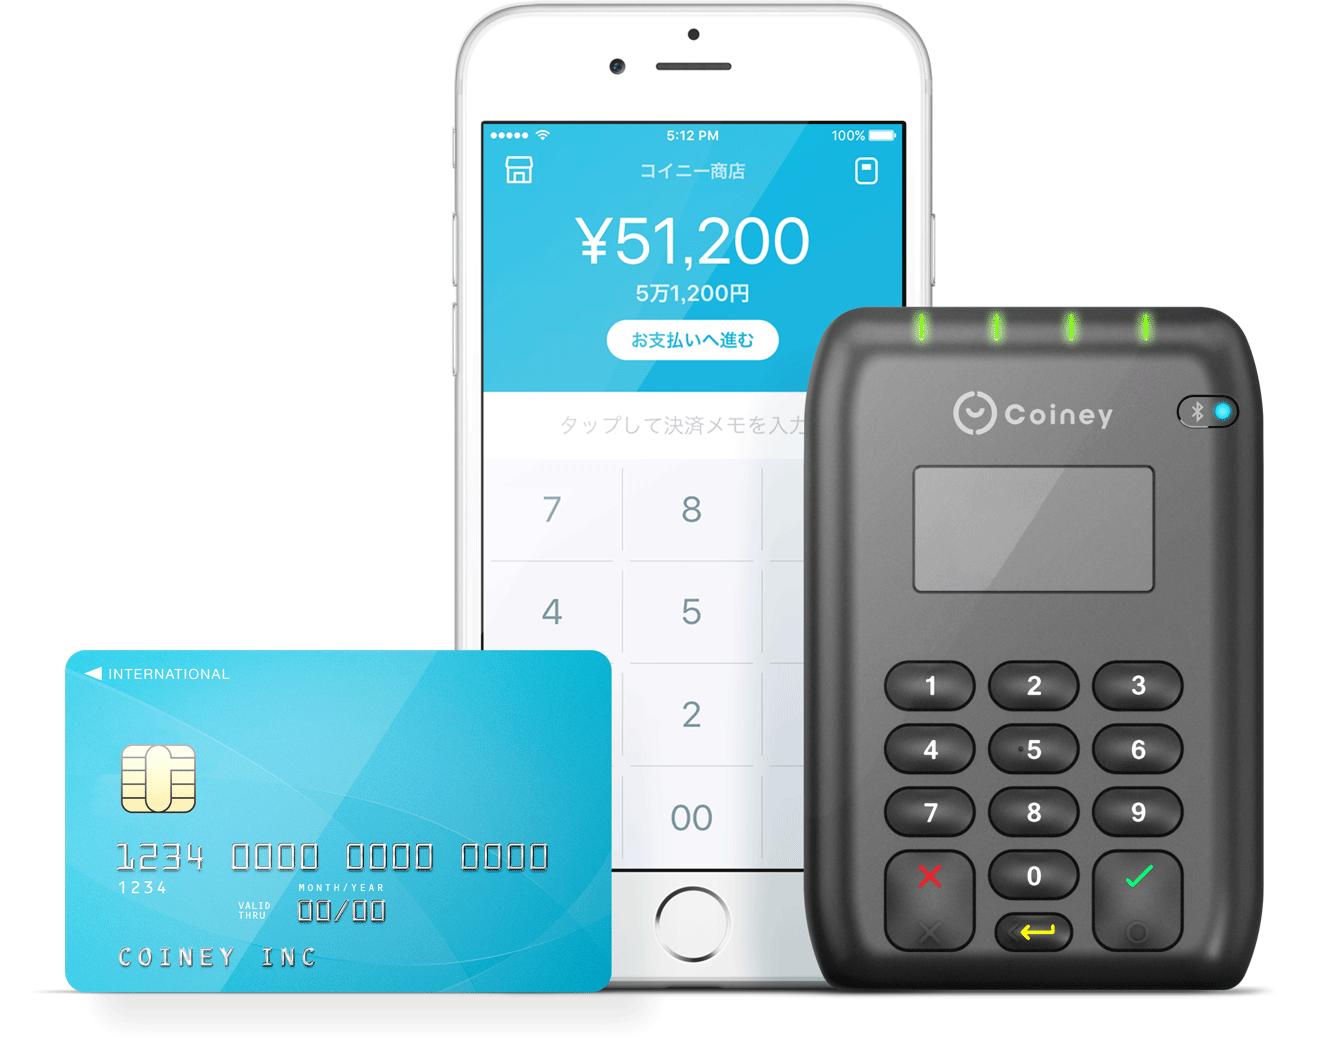 Terminal card app